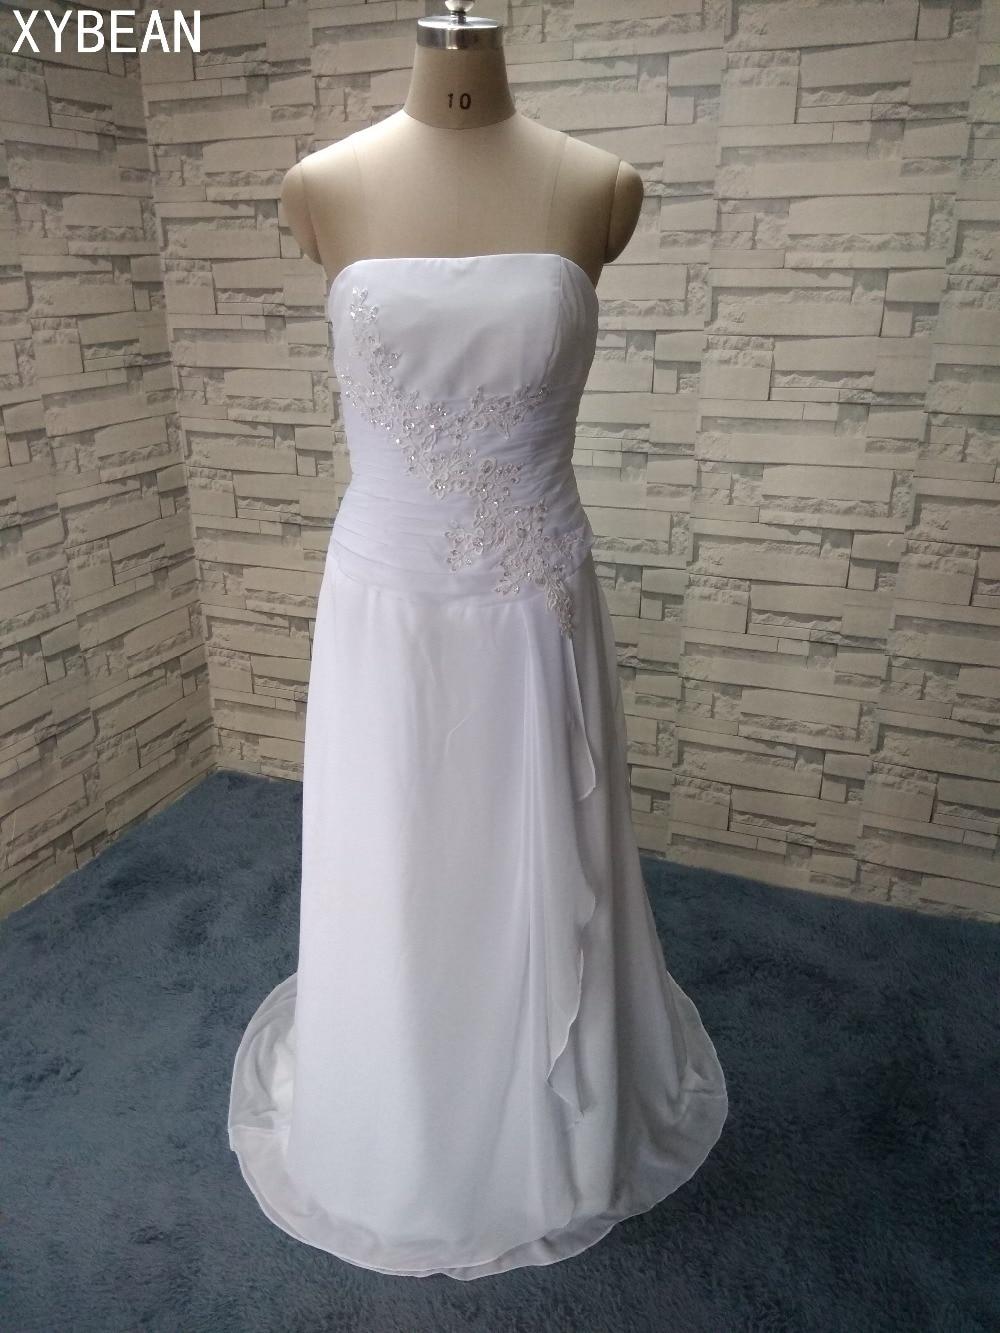 2018 Pengiriman Gratis Baru! Gaun Panjang Sifon Tanpa Tali Dengan Kereta Gaun Pengantin Putih & Gading Dalam Stok FS050